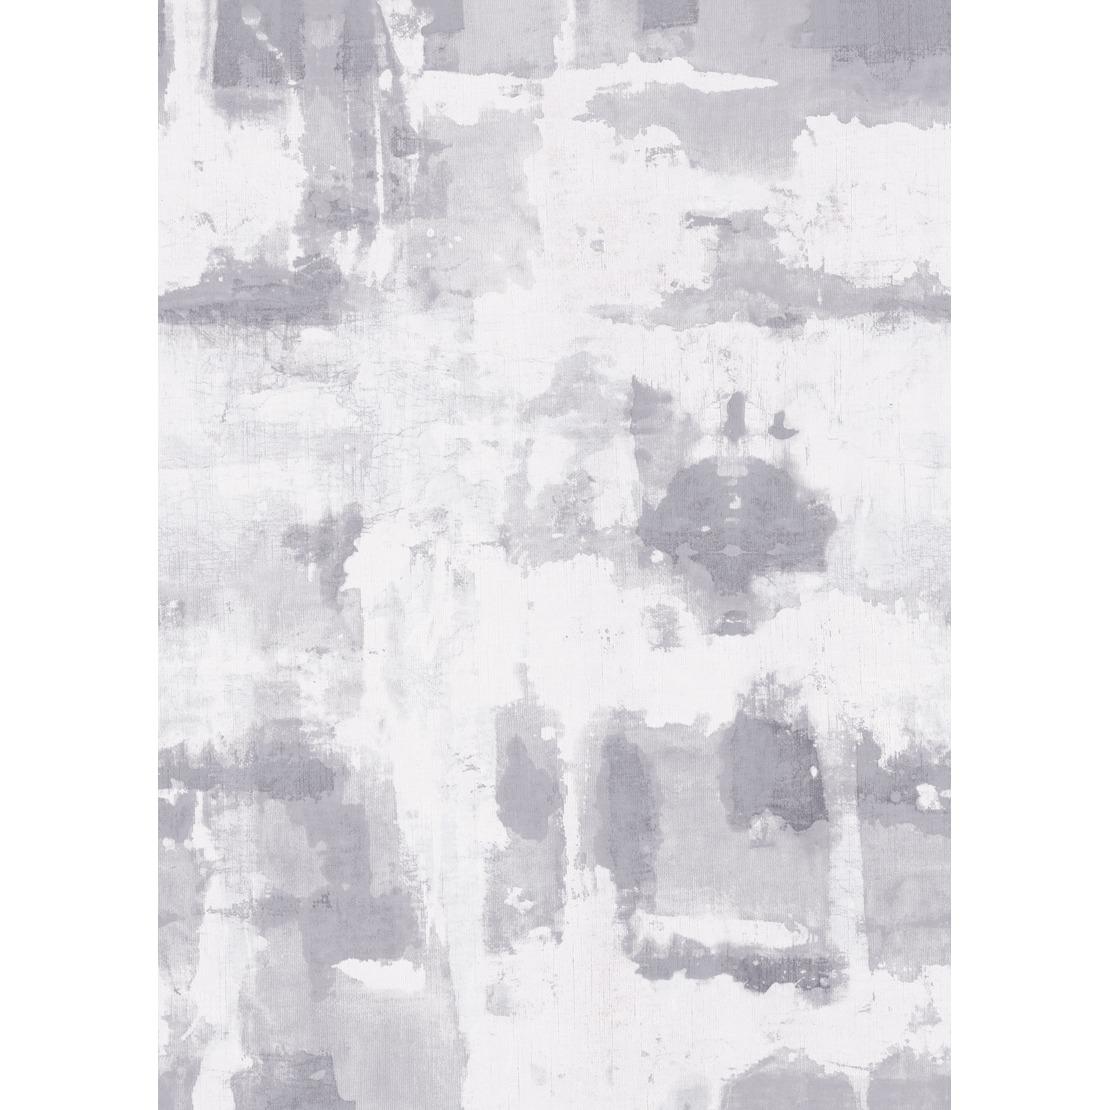 Французские обои Casadeco,  коллекция Oxyde, артикулOXY29199144